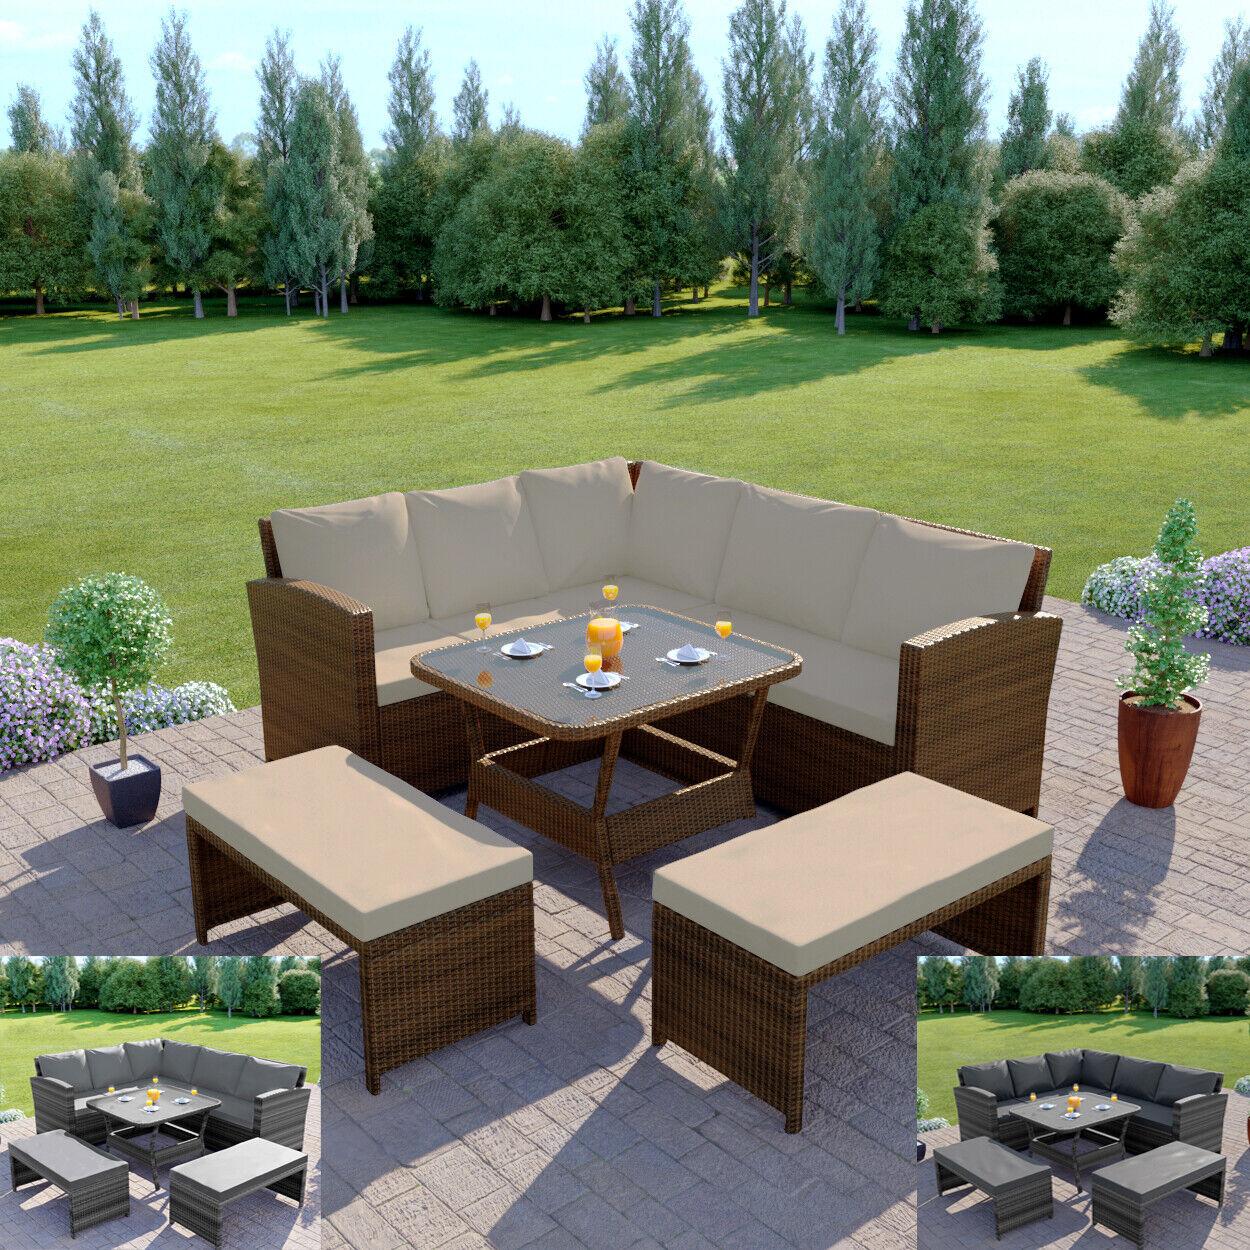 Garden Furniture - Rattan Garden Furniture Corner Dining Table Sofa Patio Set Bench Grey Brown